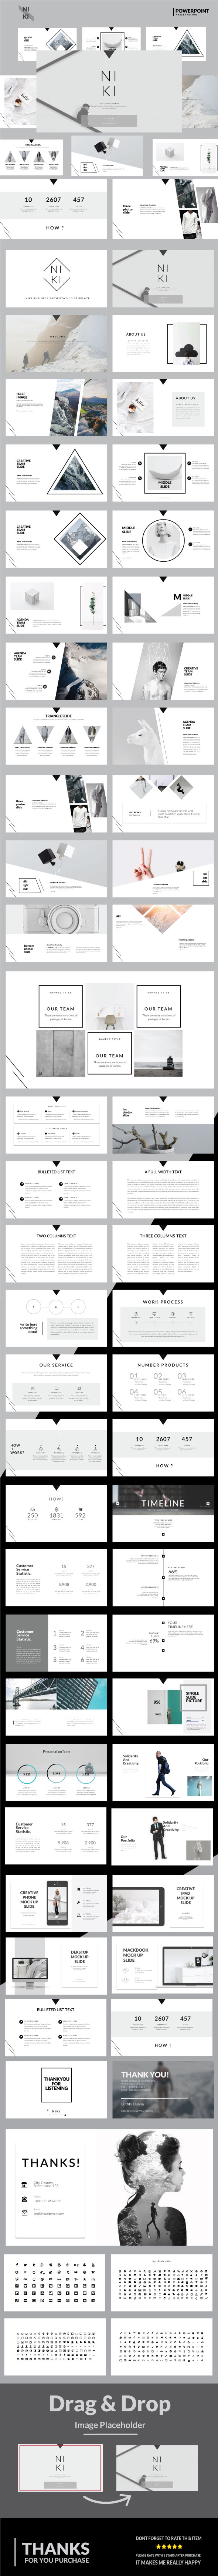 Niki Keynote Presentation Templates - Business Keynote Templates